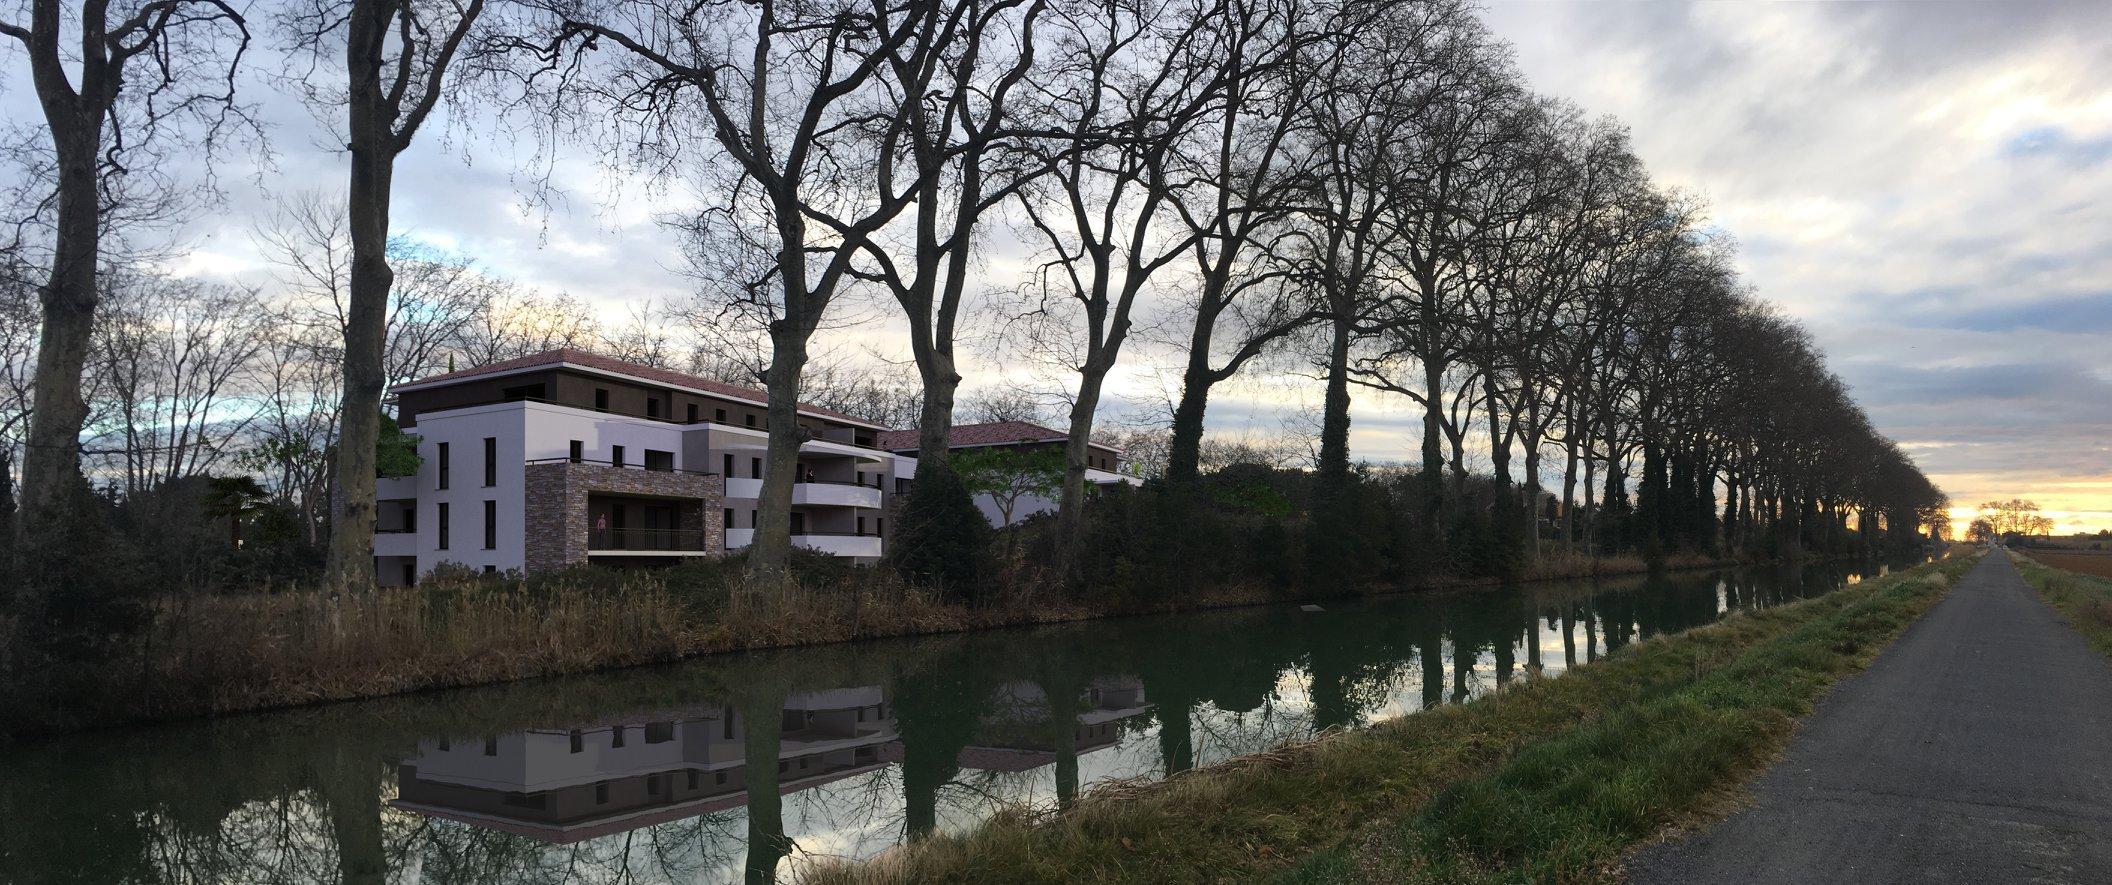 Résidence Bastida Frascati, une nouvelle étape !